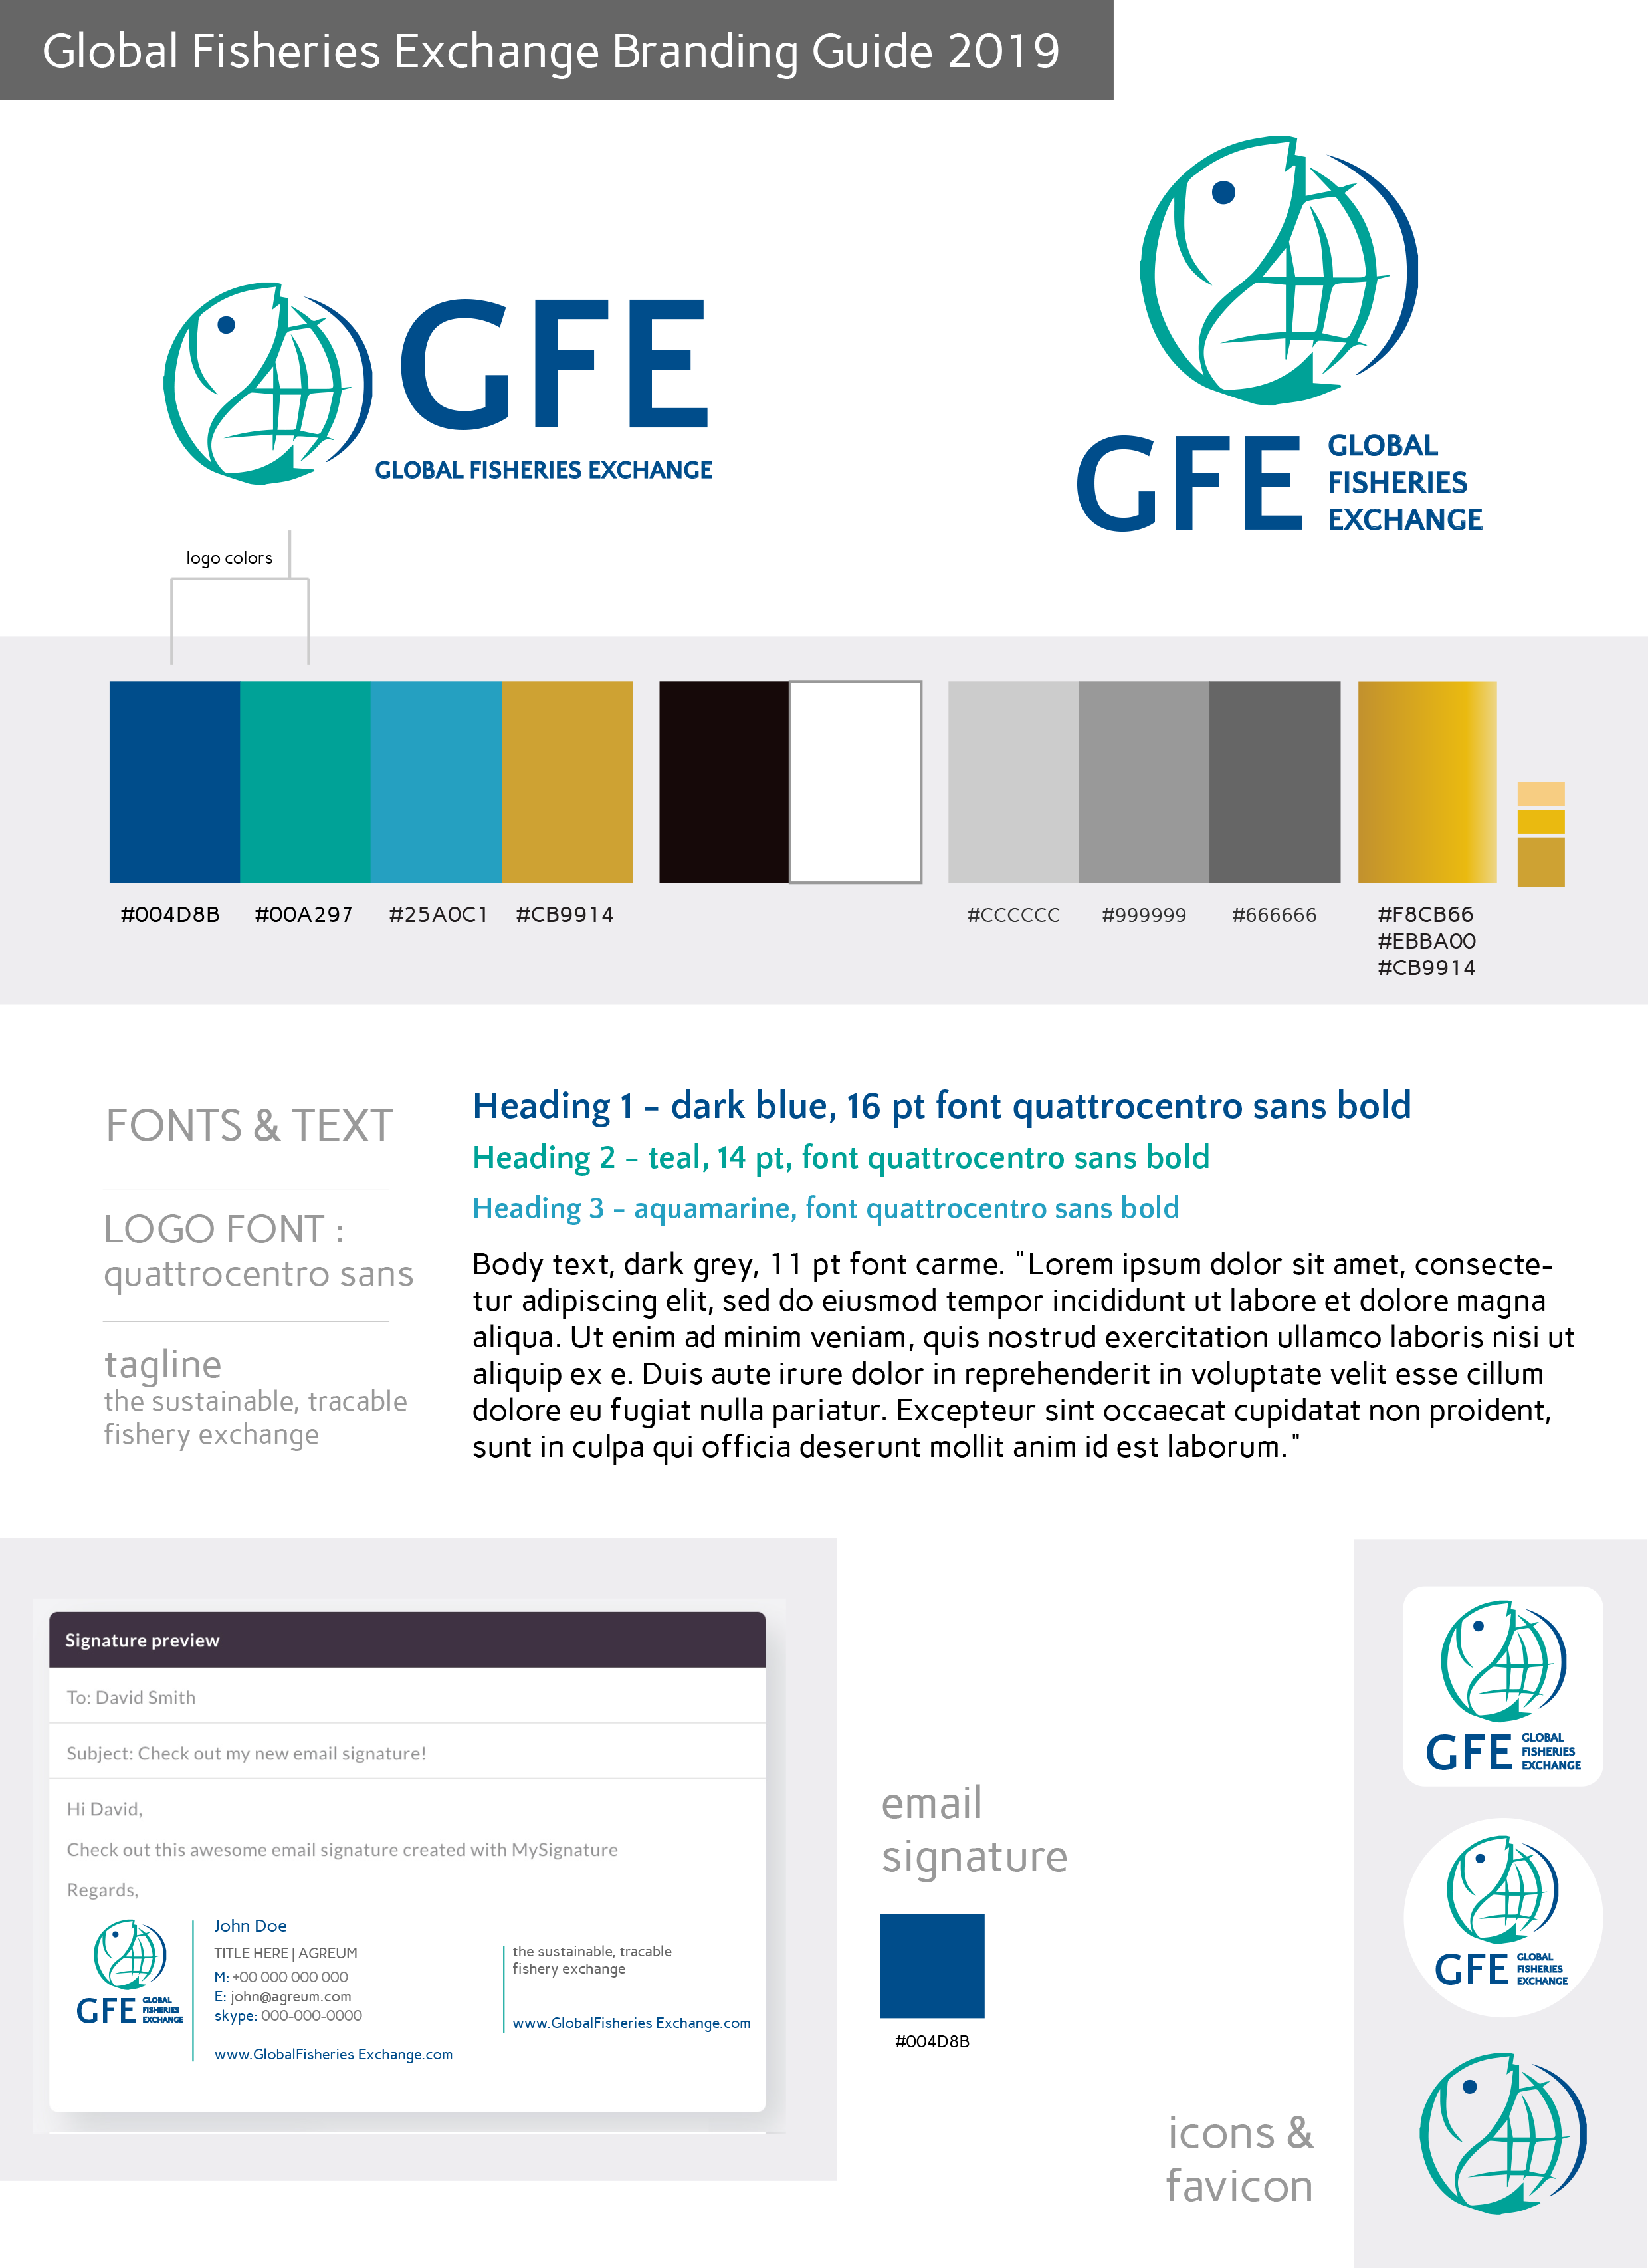 GFE Branding Guide 2019 copy